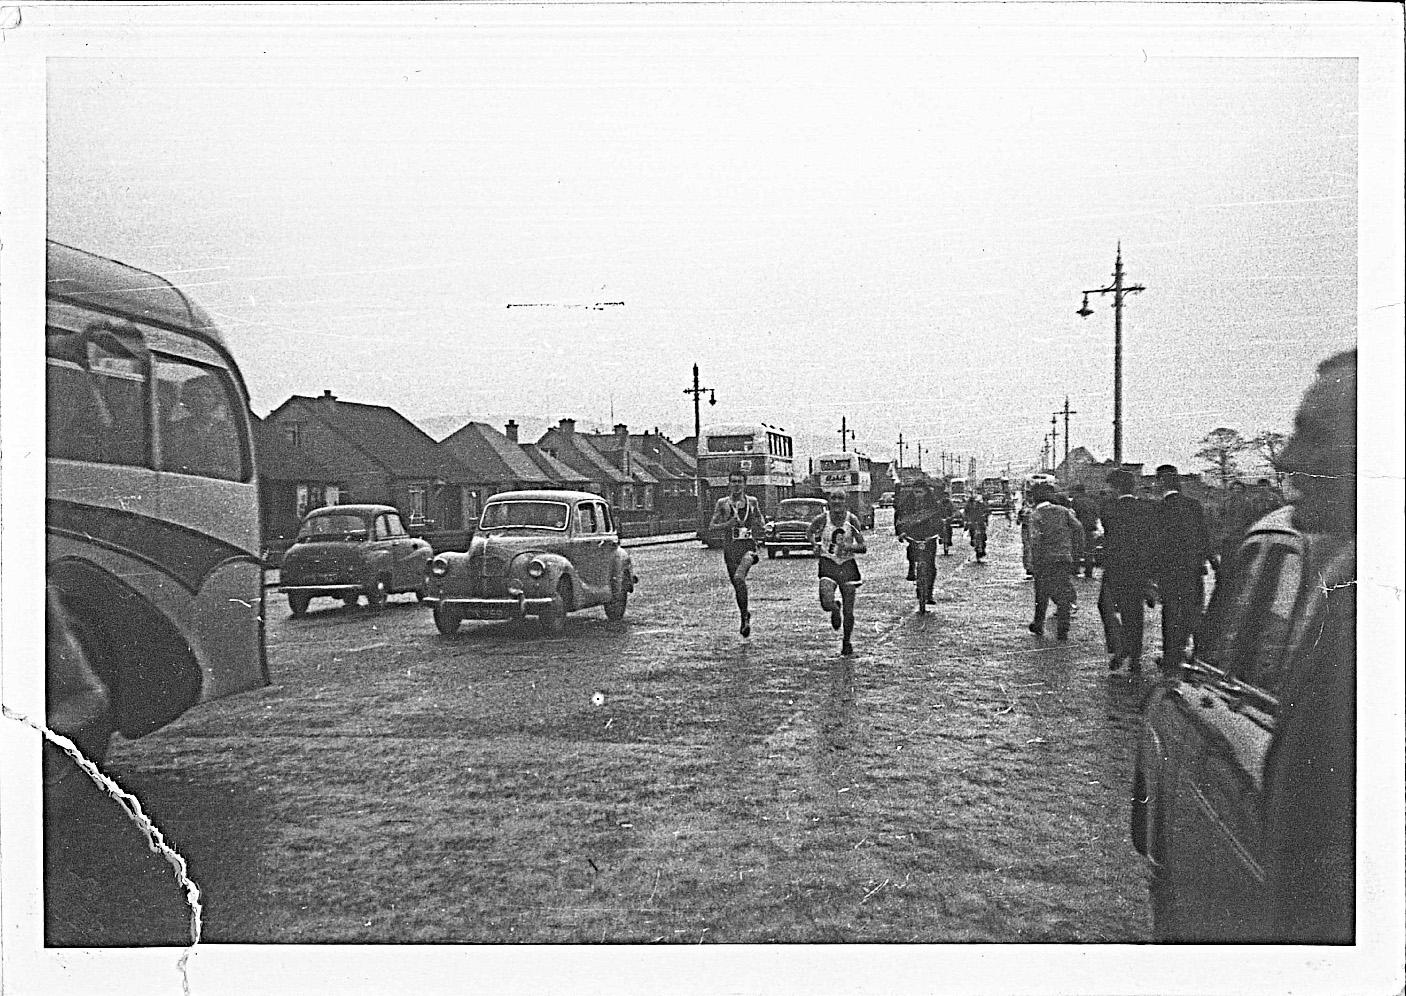 now-edinburgh-to-glasgow-1st-leg-nov-1958